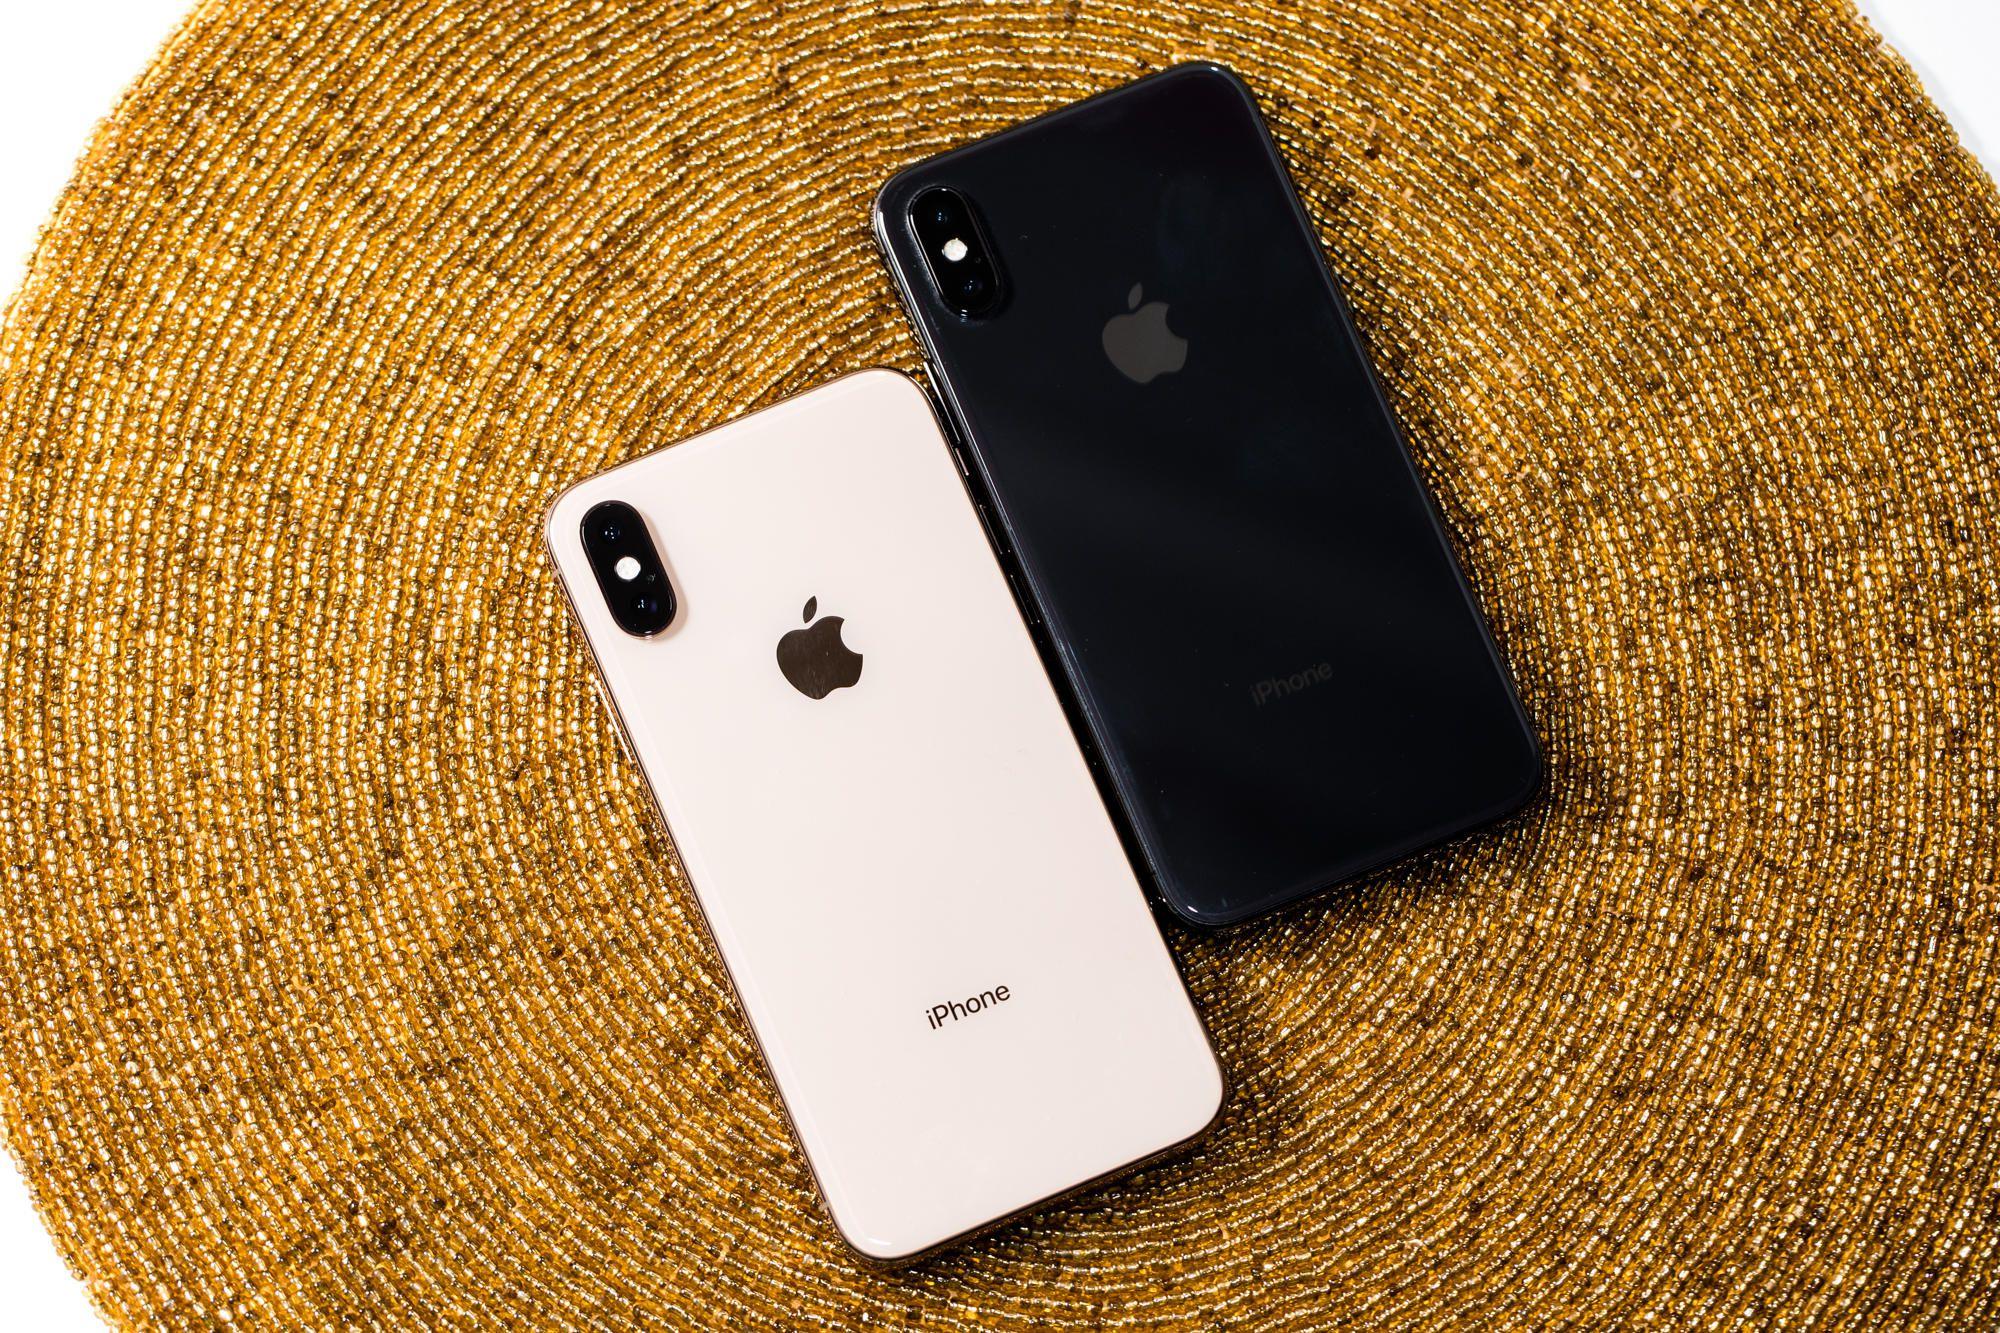 iphone-x-vs-iphone-xs-5005